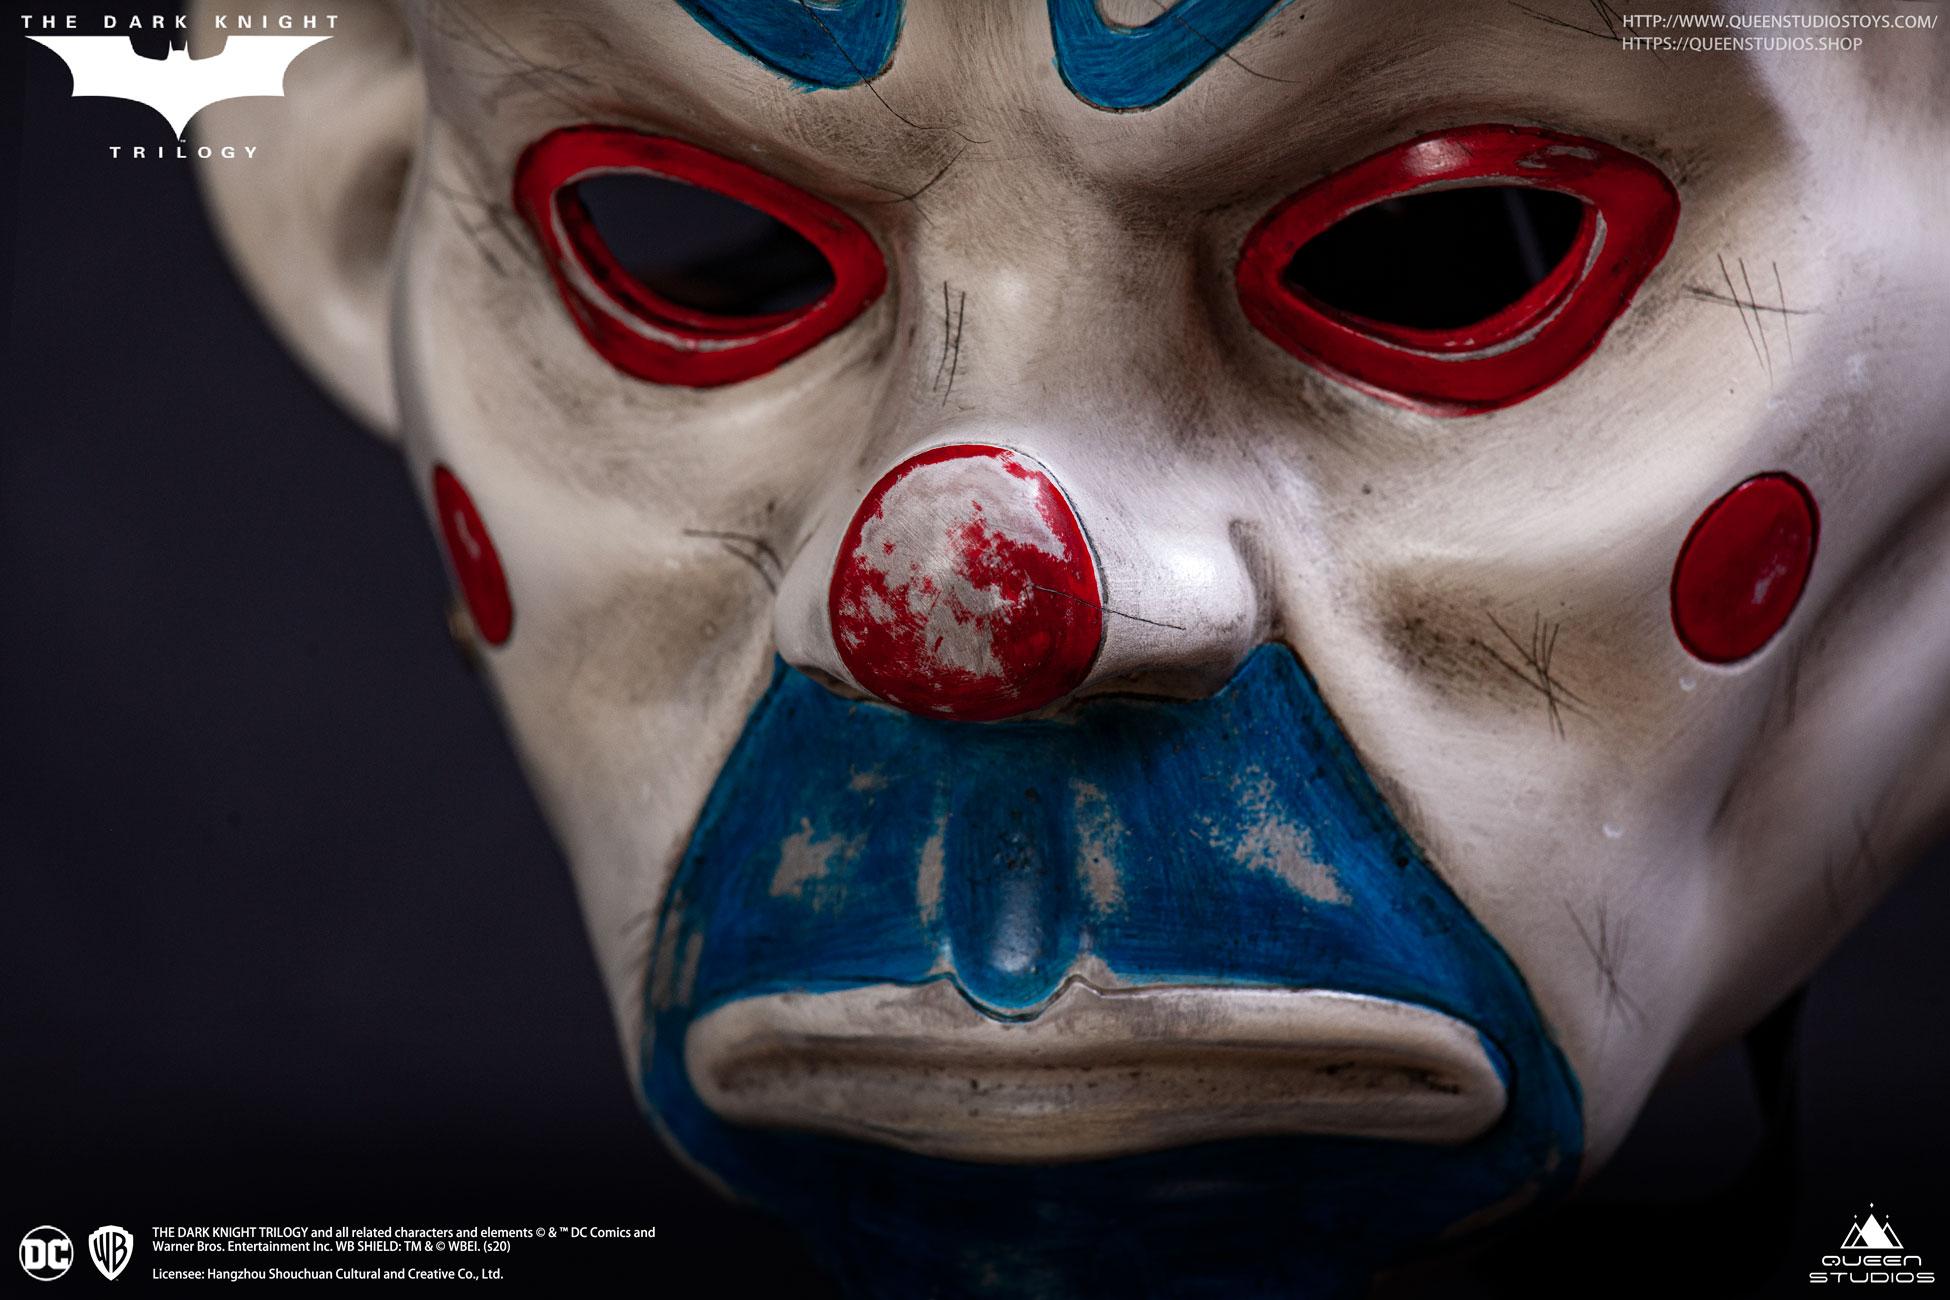 Link a Queen_Studios_joker_mask_replica-3